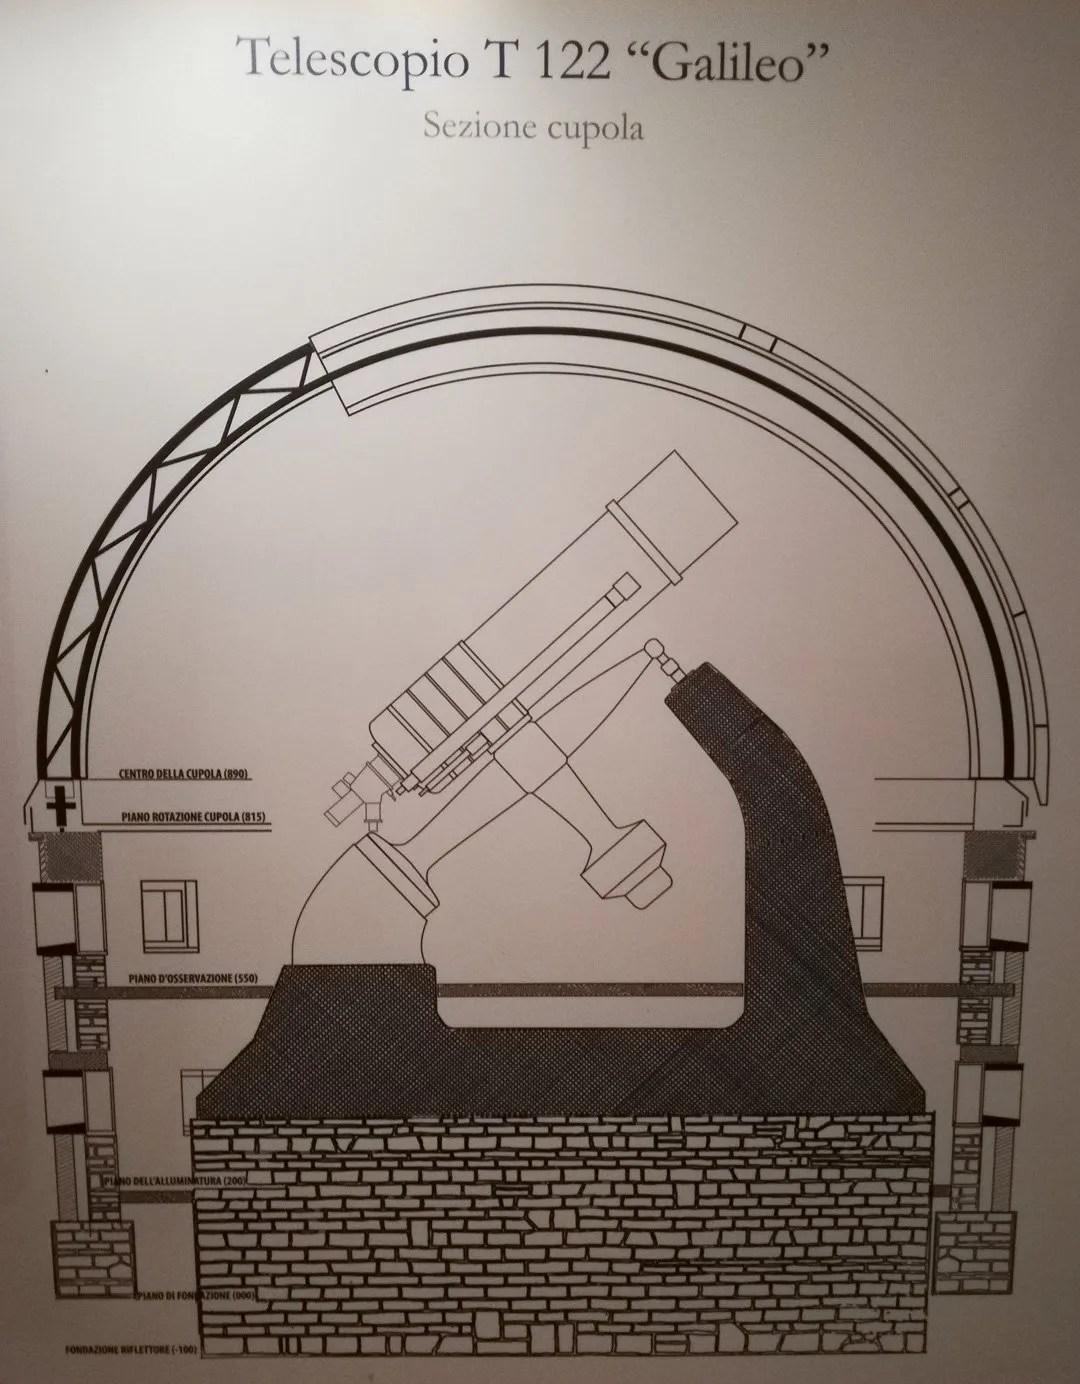 Telescopio Galileo Asiago